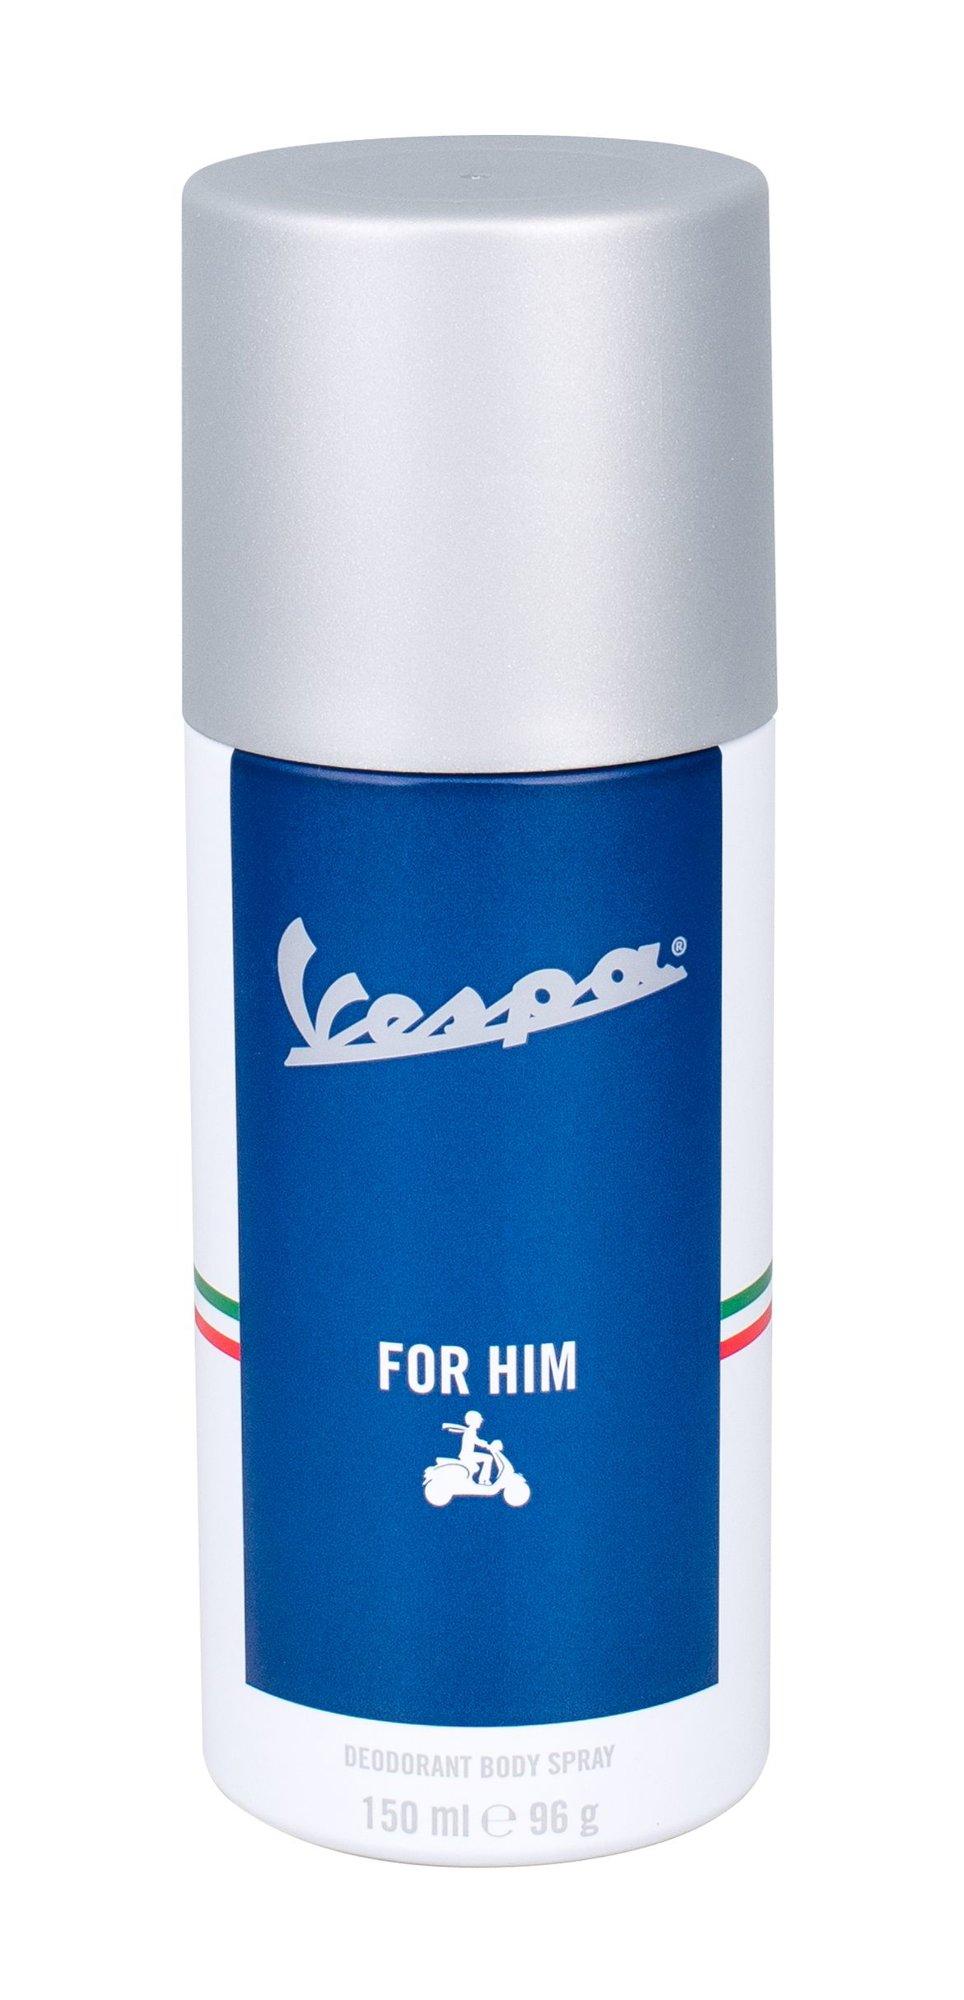 Vespa Vespa For Him Deodorant 150ml